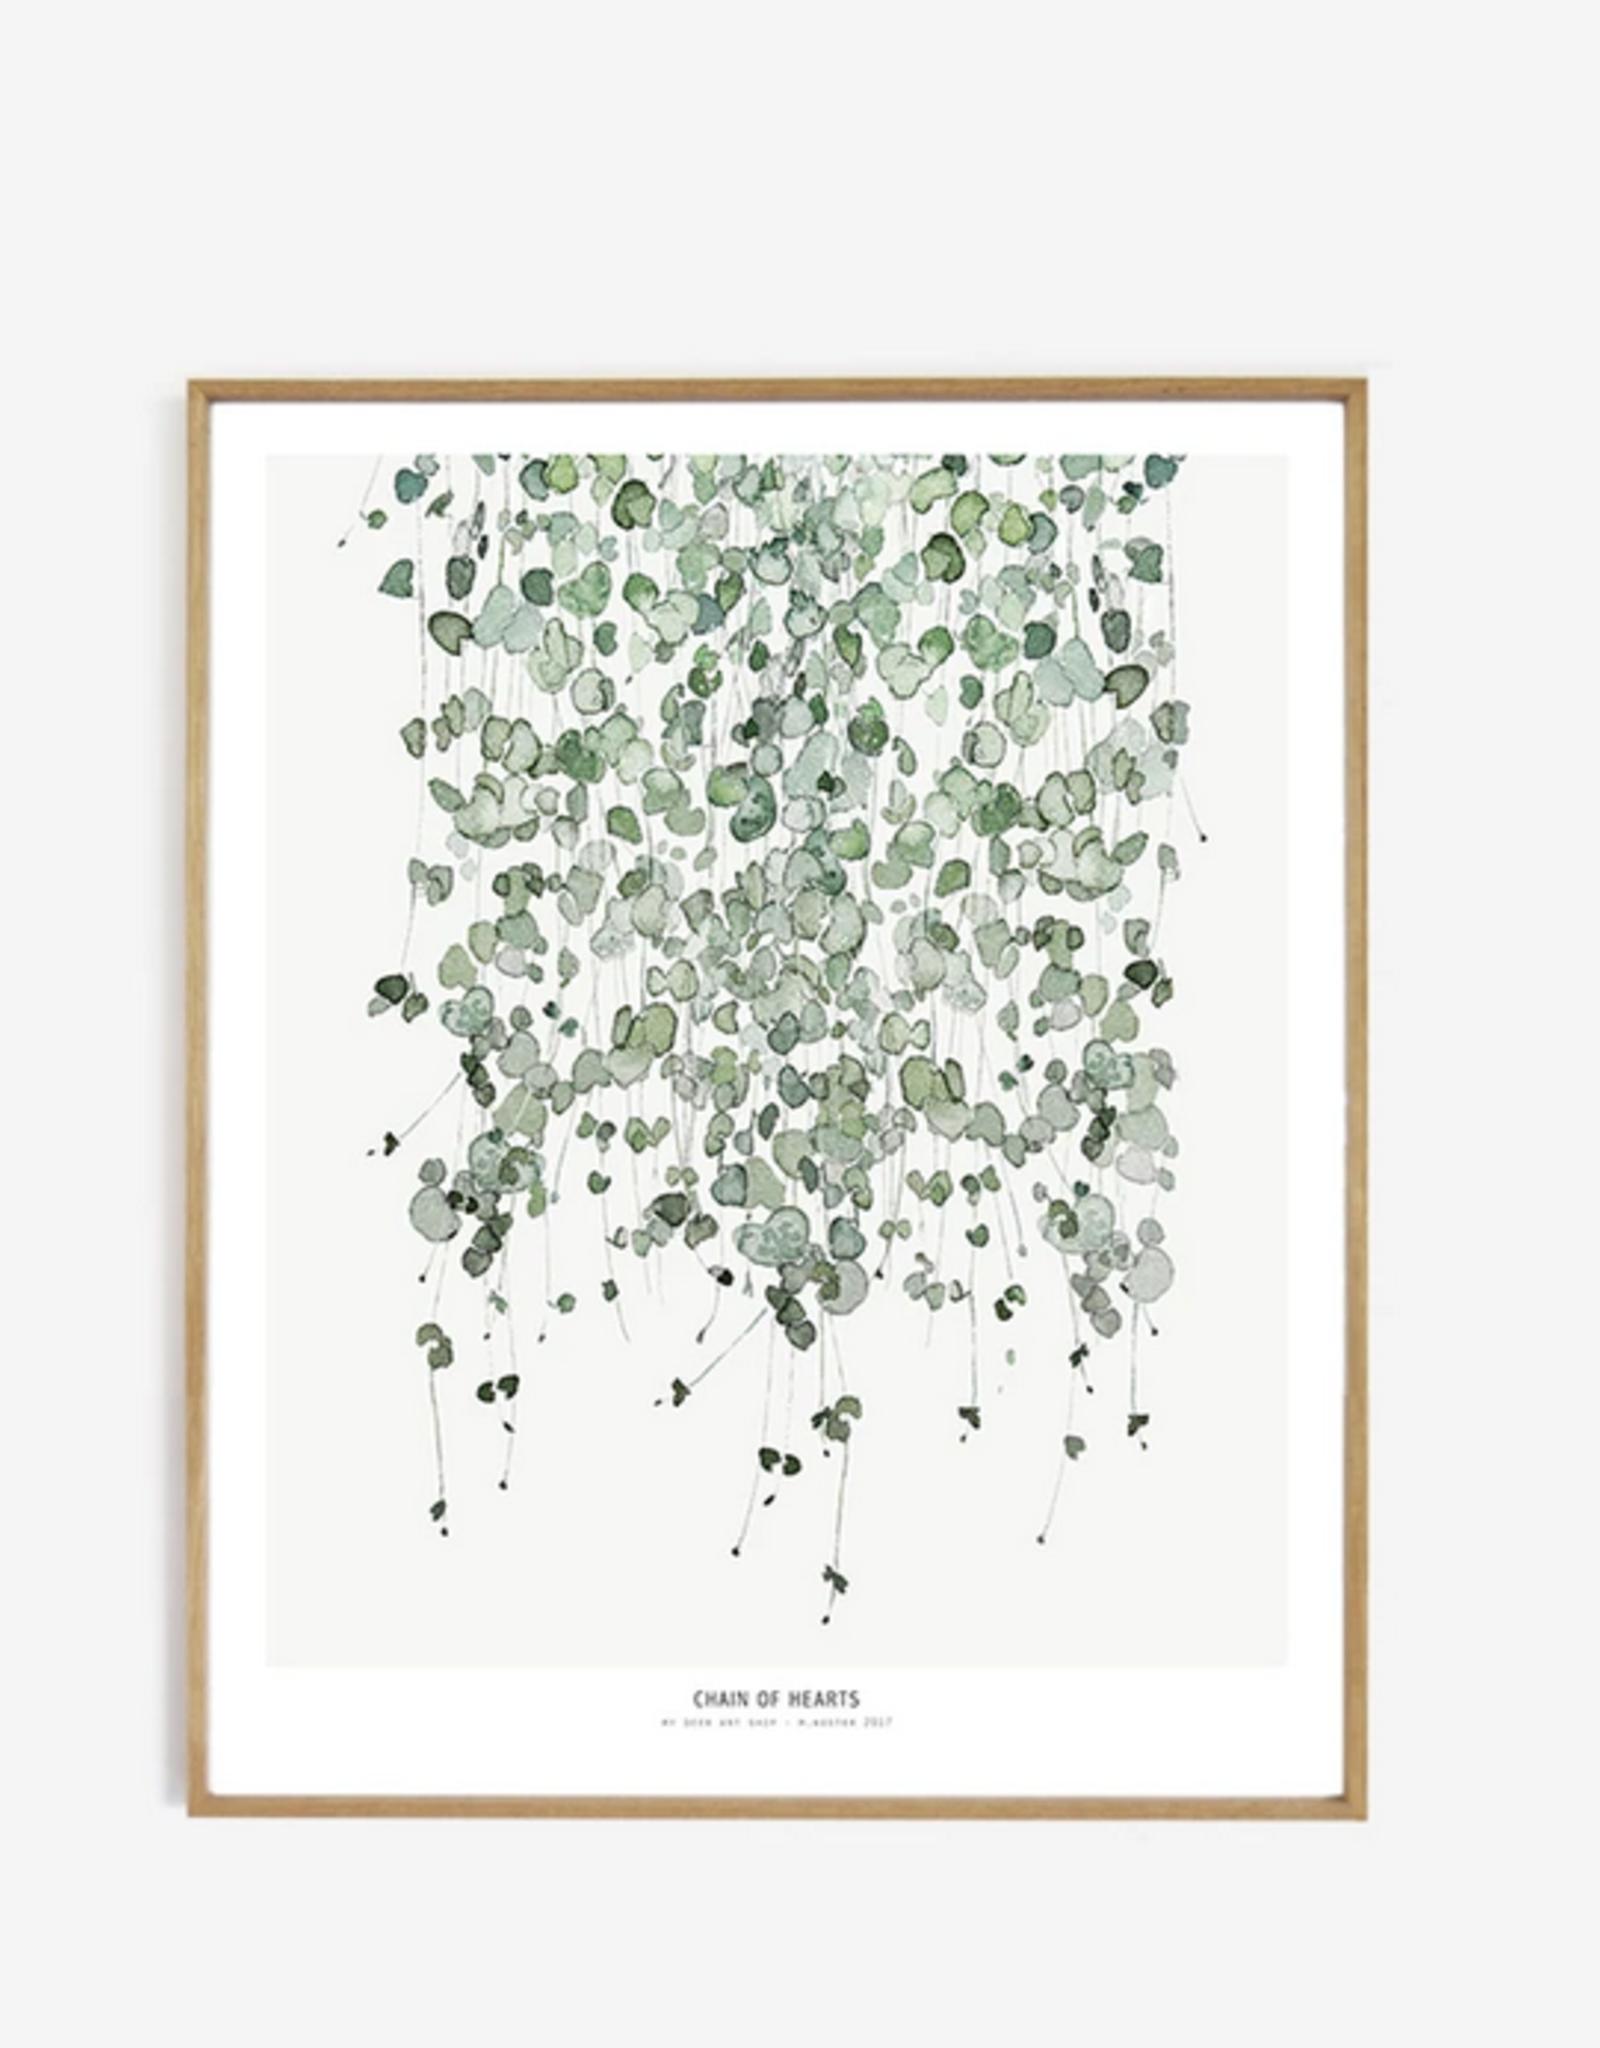 My deer art shop My deer art - Chain of hearts - 30x40